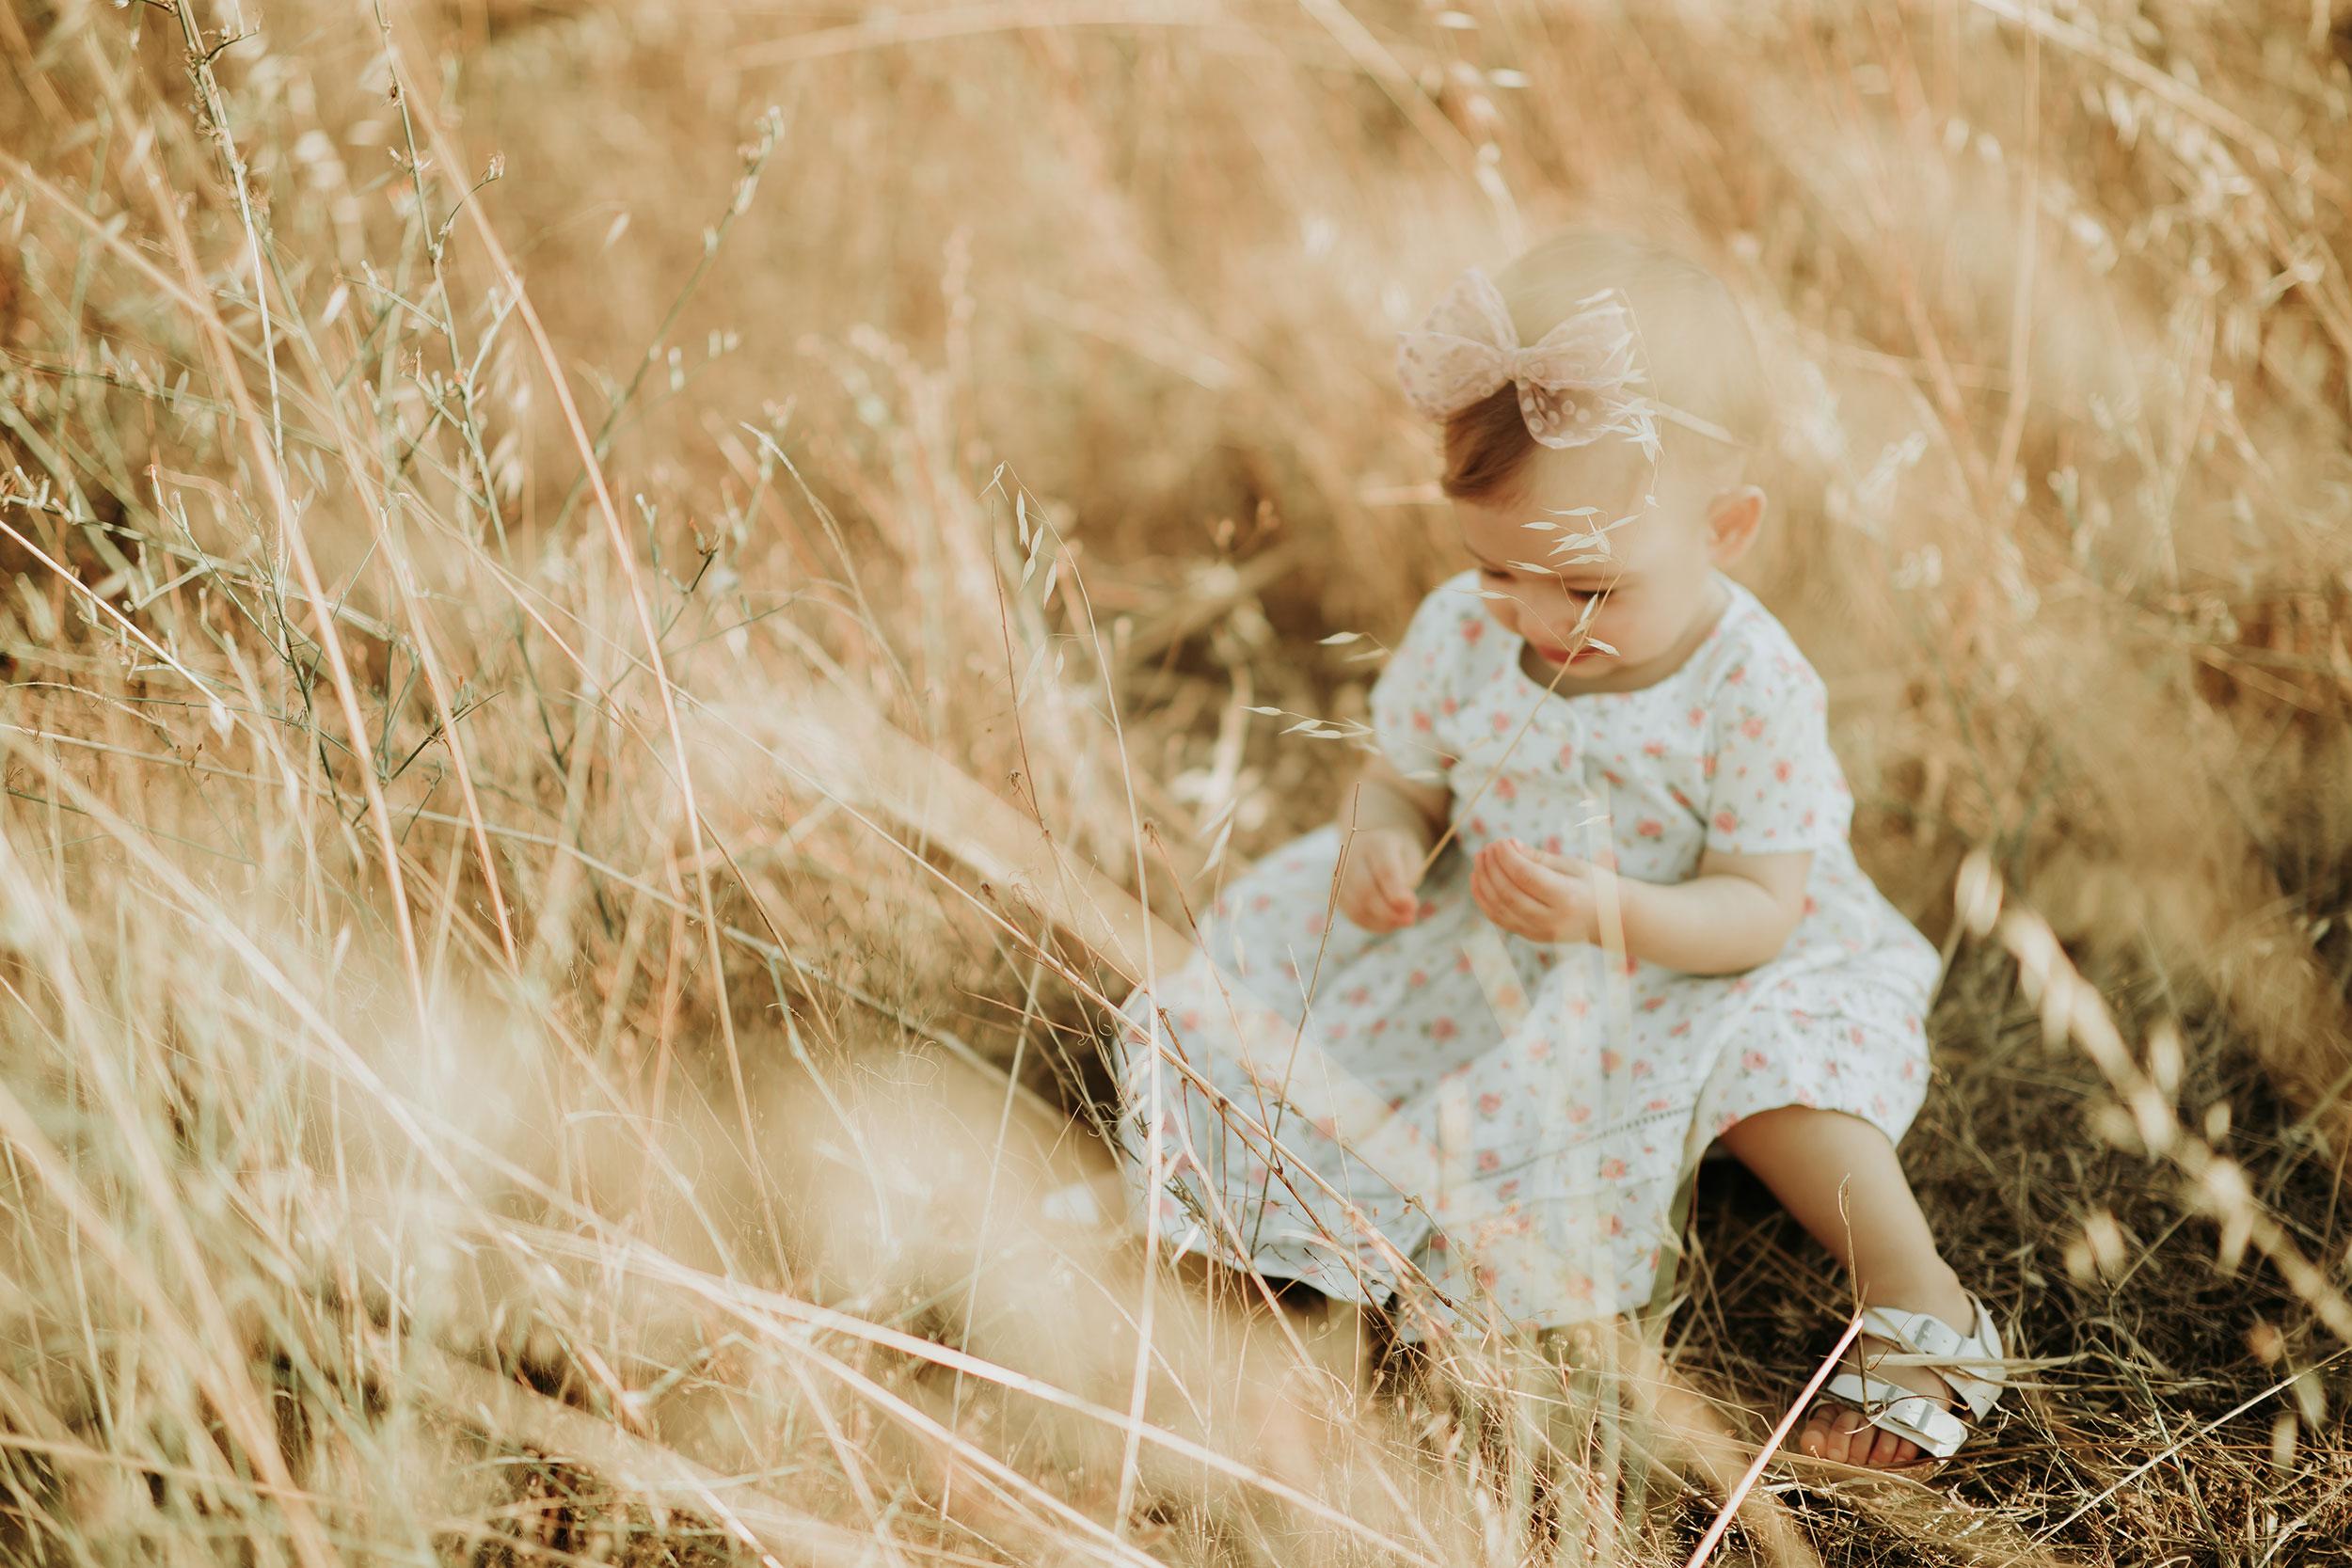 Baby's outdoor family photoshoot